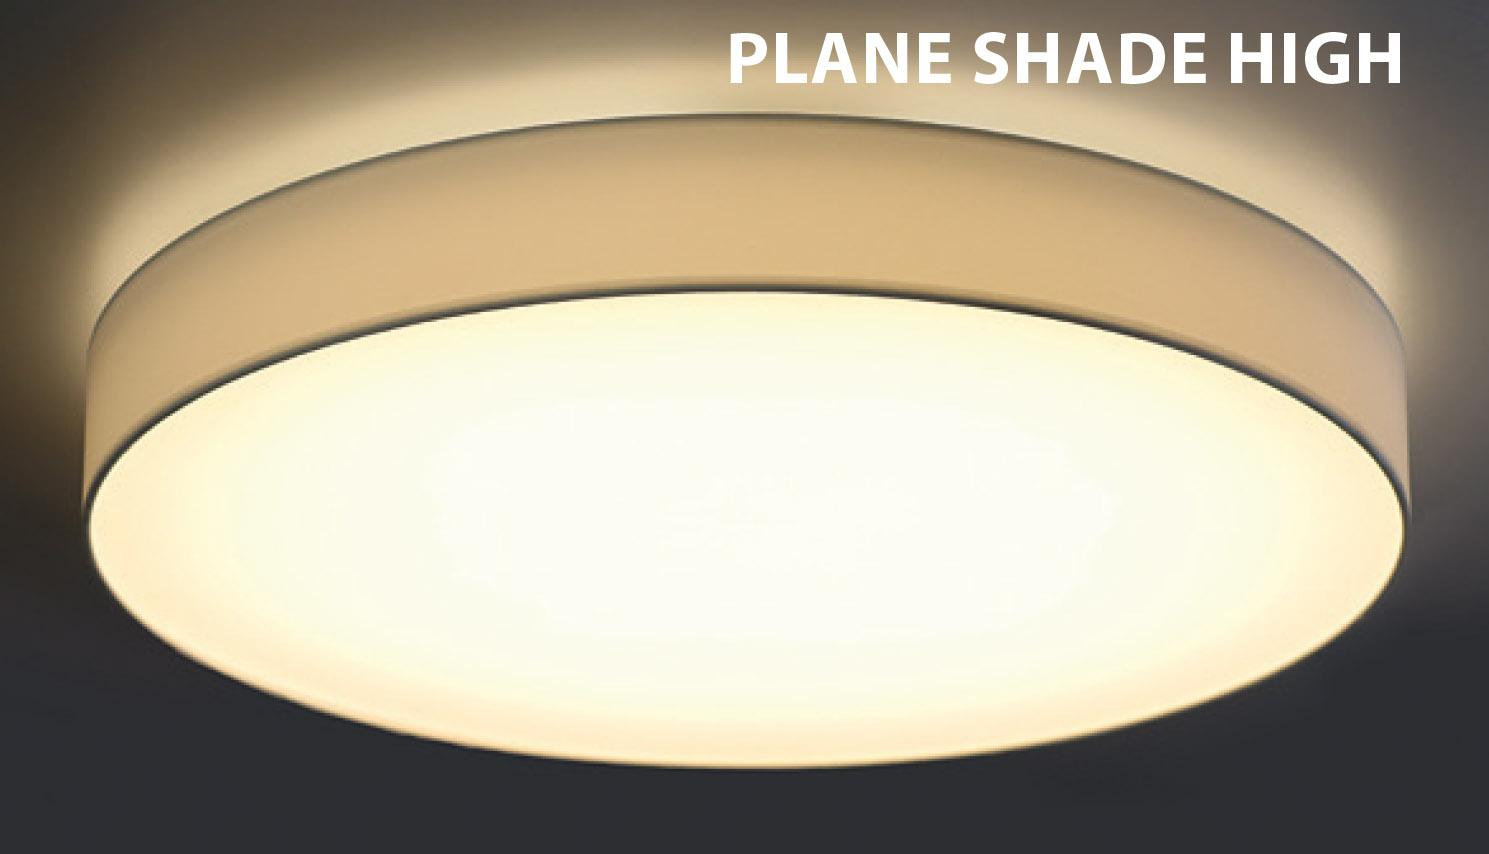 Plane Shade High